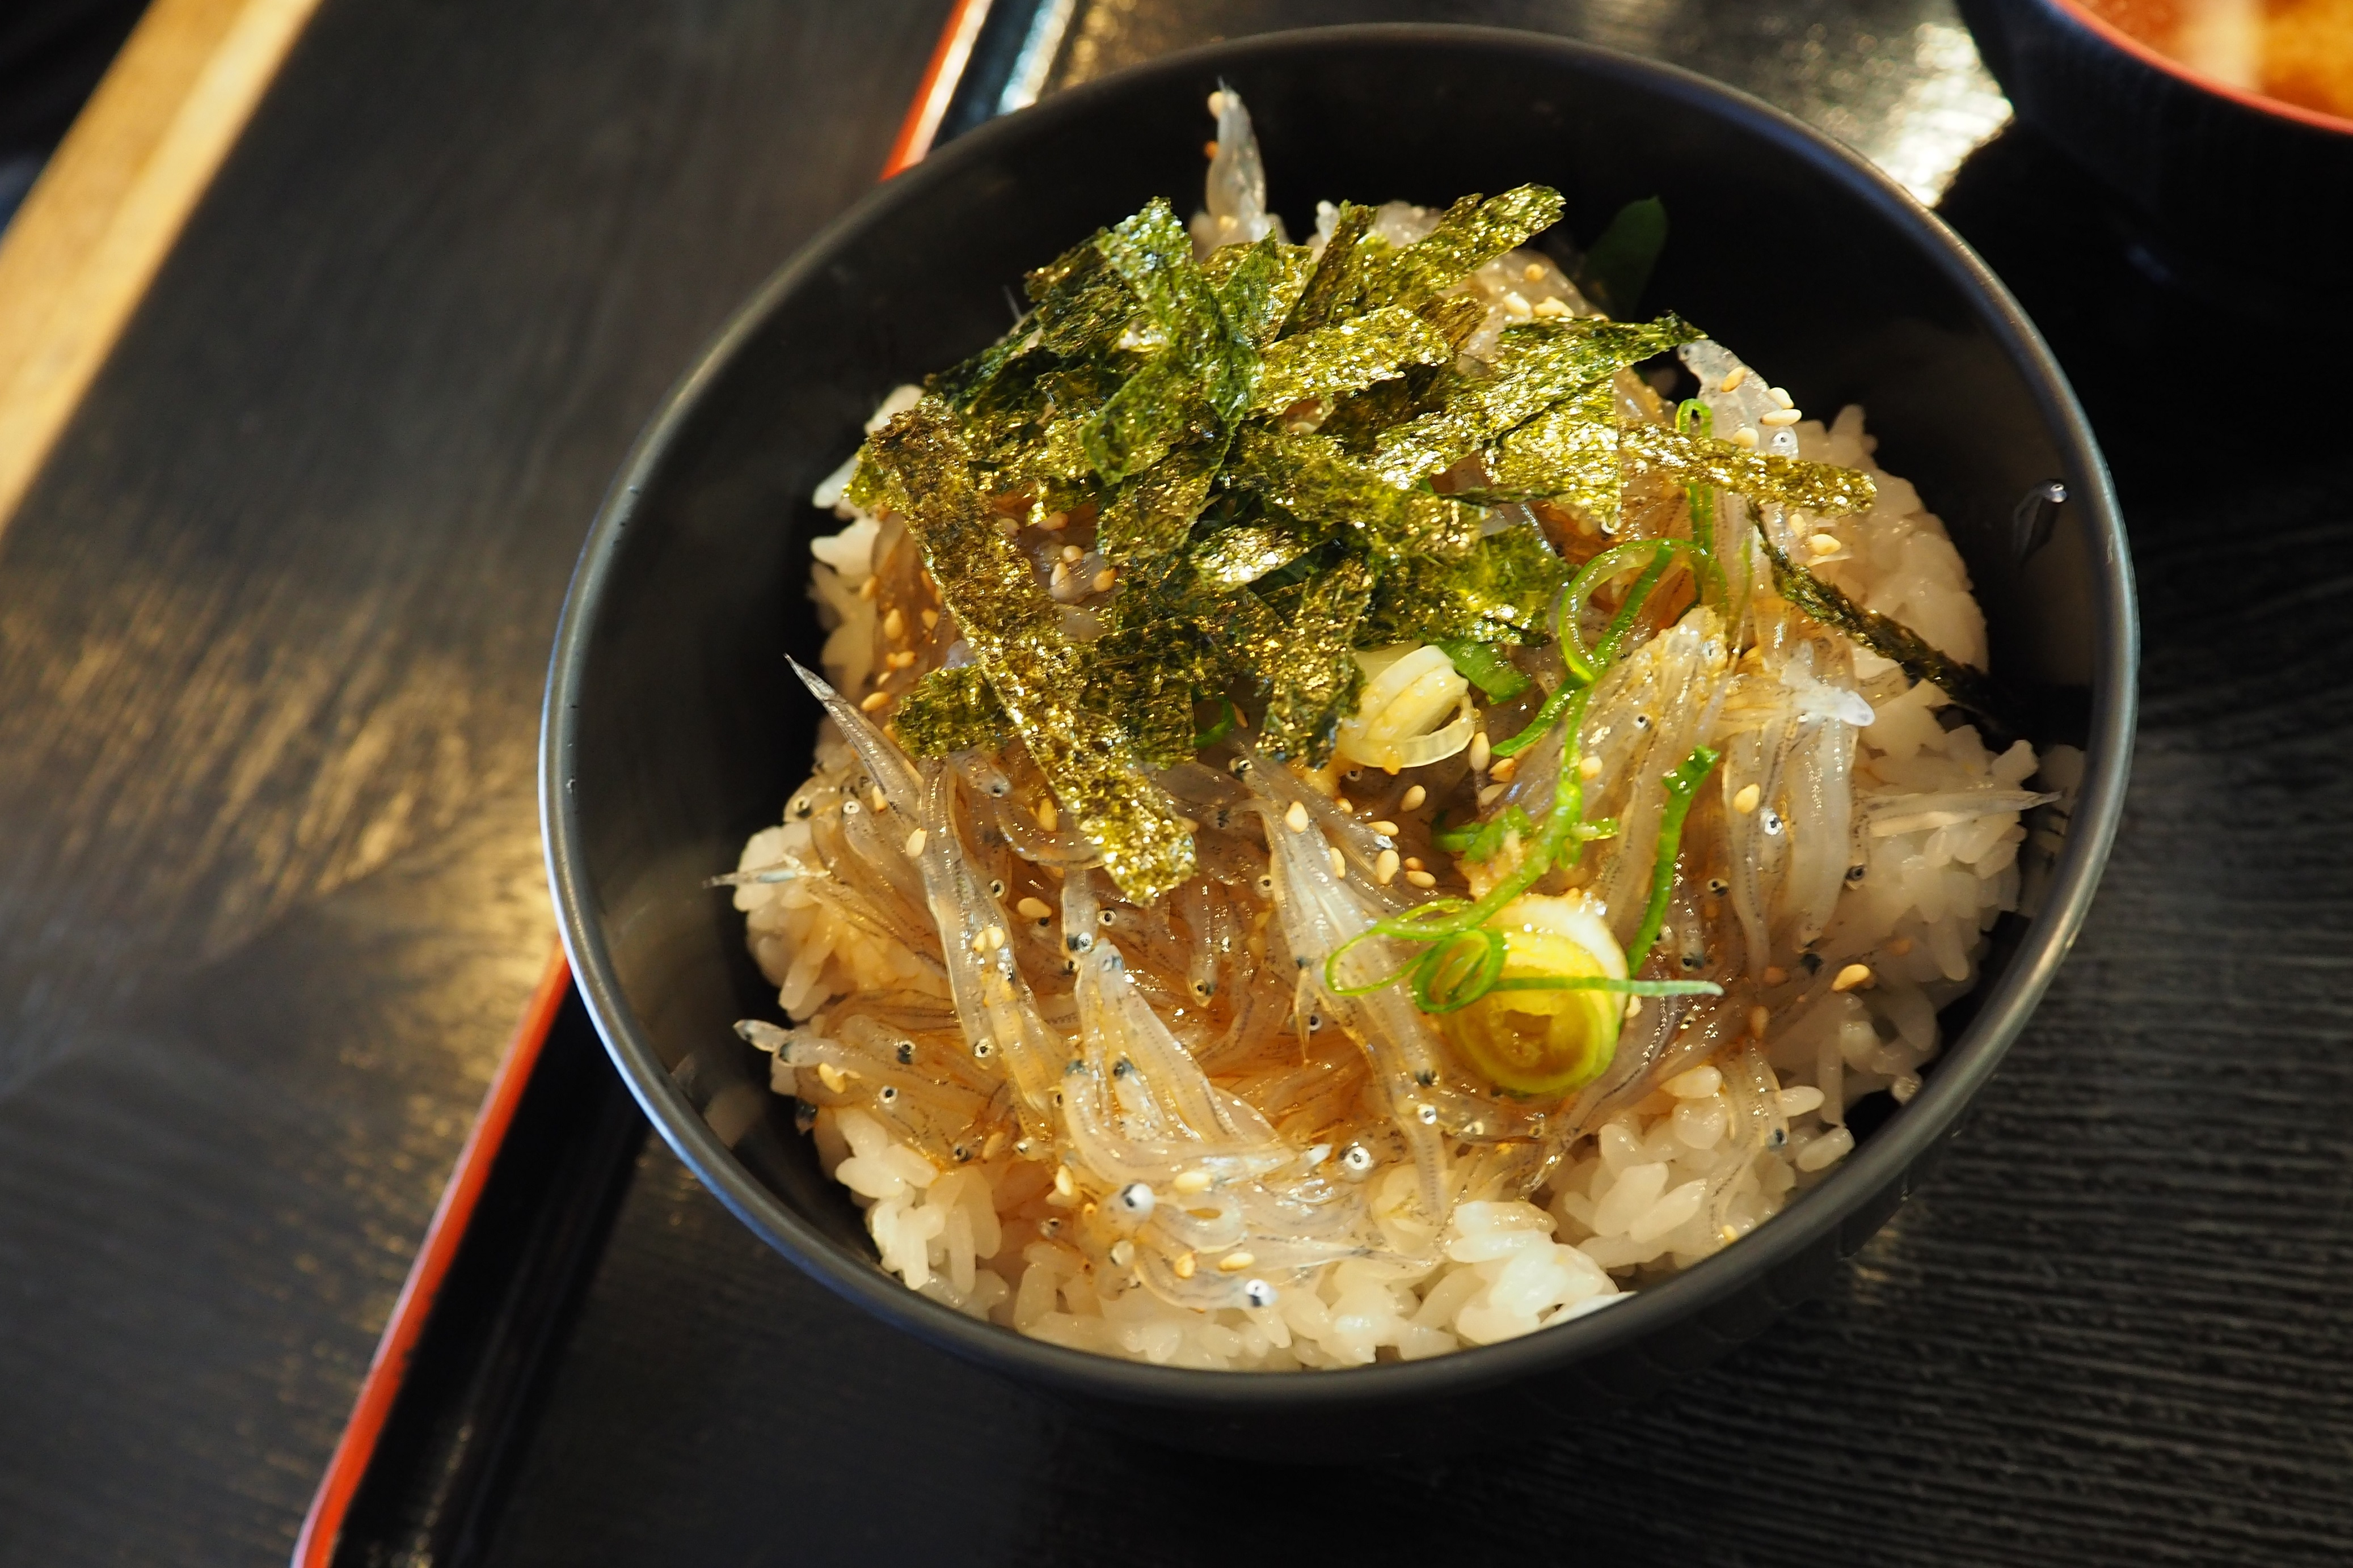 harleydavidson-motorcycle-touring-blog-wakayama-yuasatown-kadoya-diningroom-rawwhitebaitbowl-3.jpg